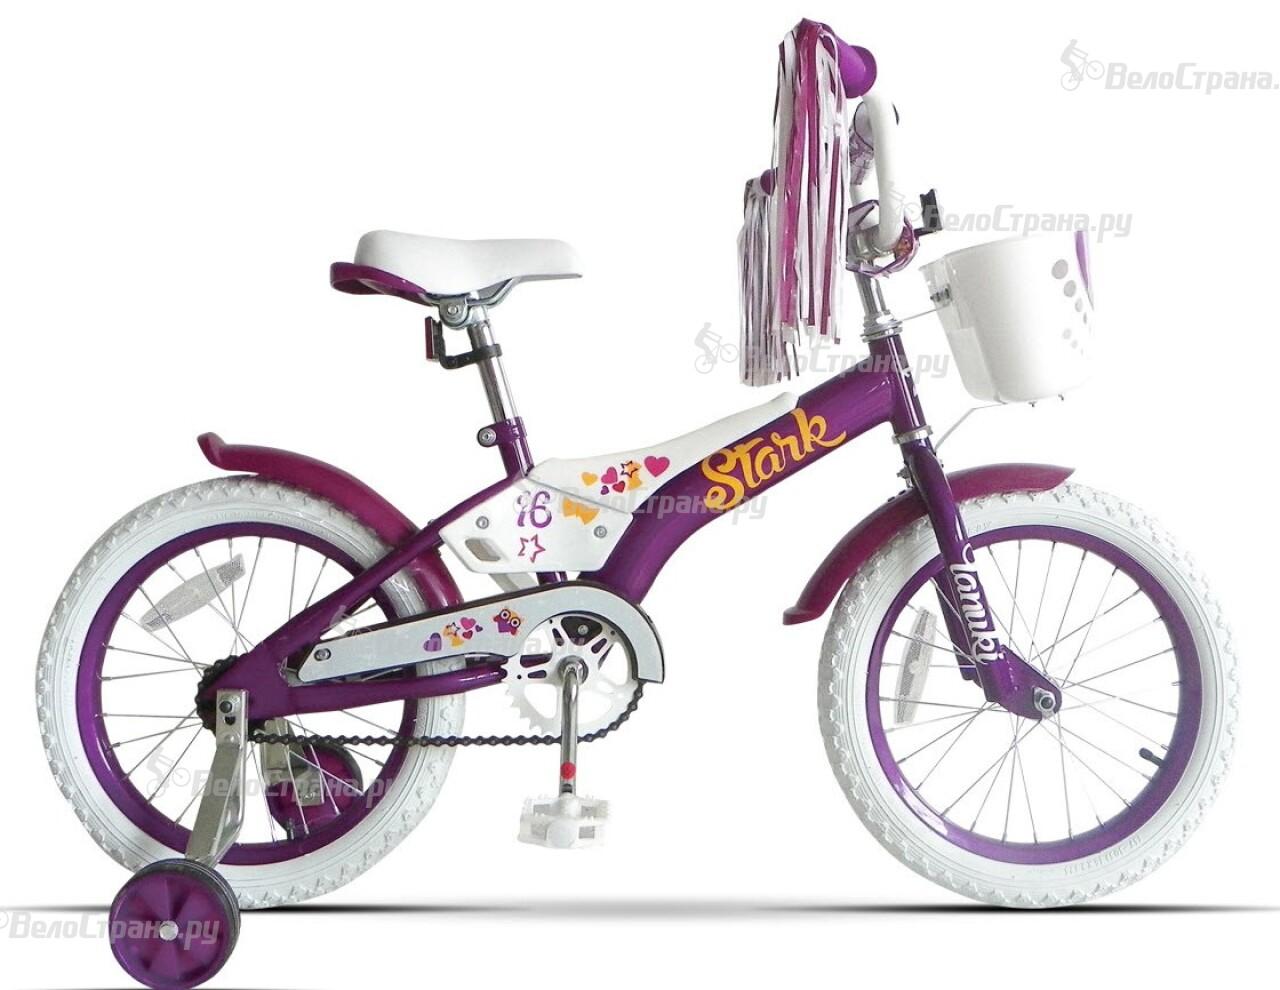 Велосипед Stark Tanuki Girl 16 (2016) stark outpost 16 2016 blue orange